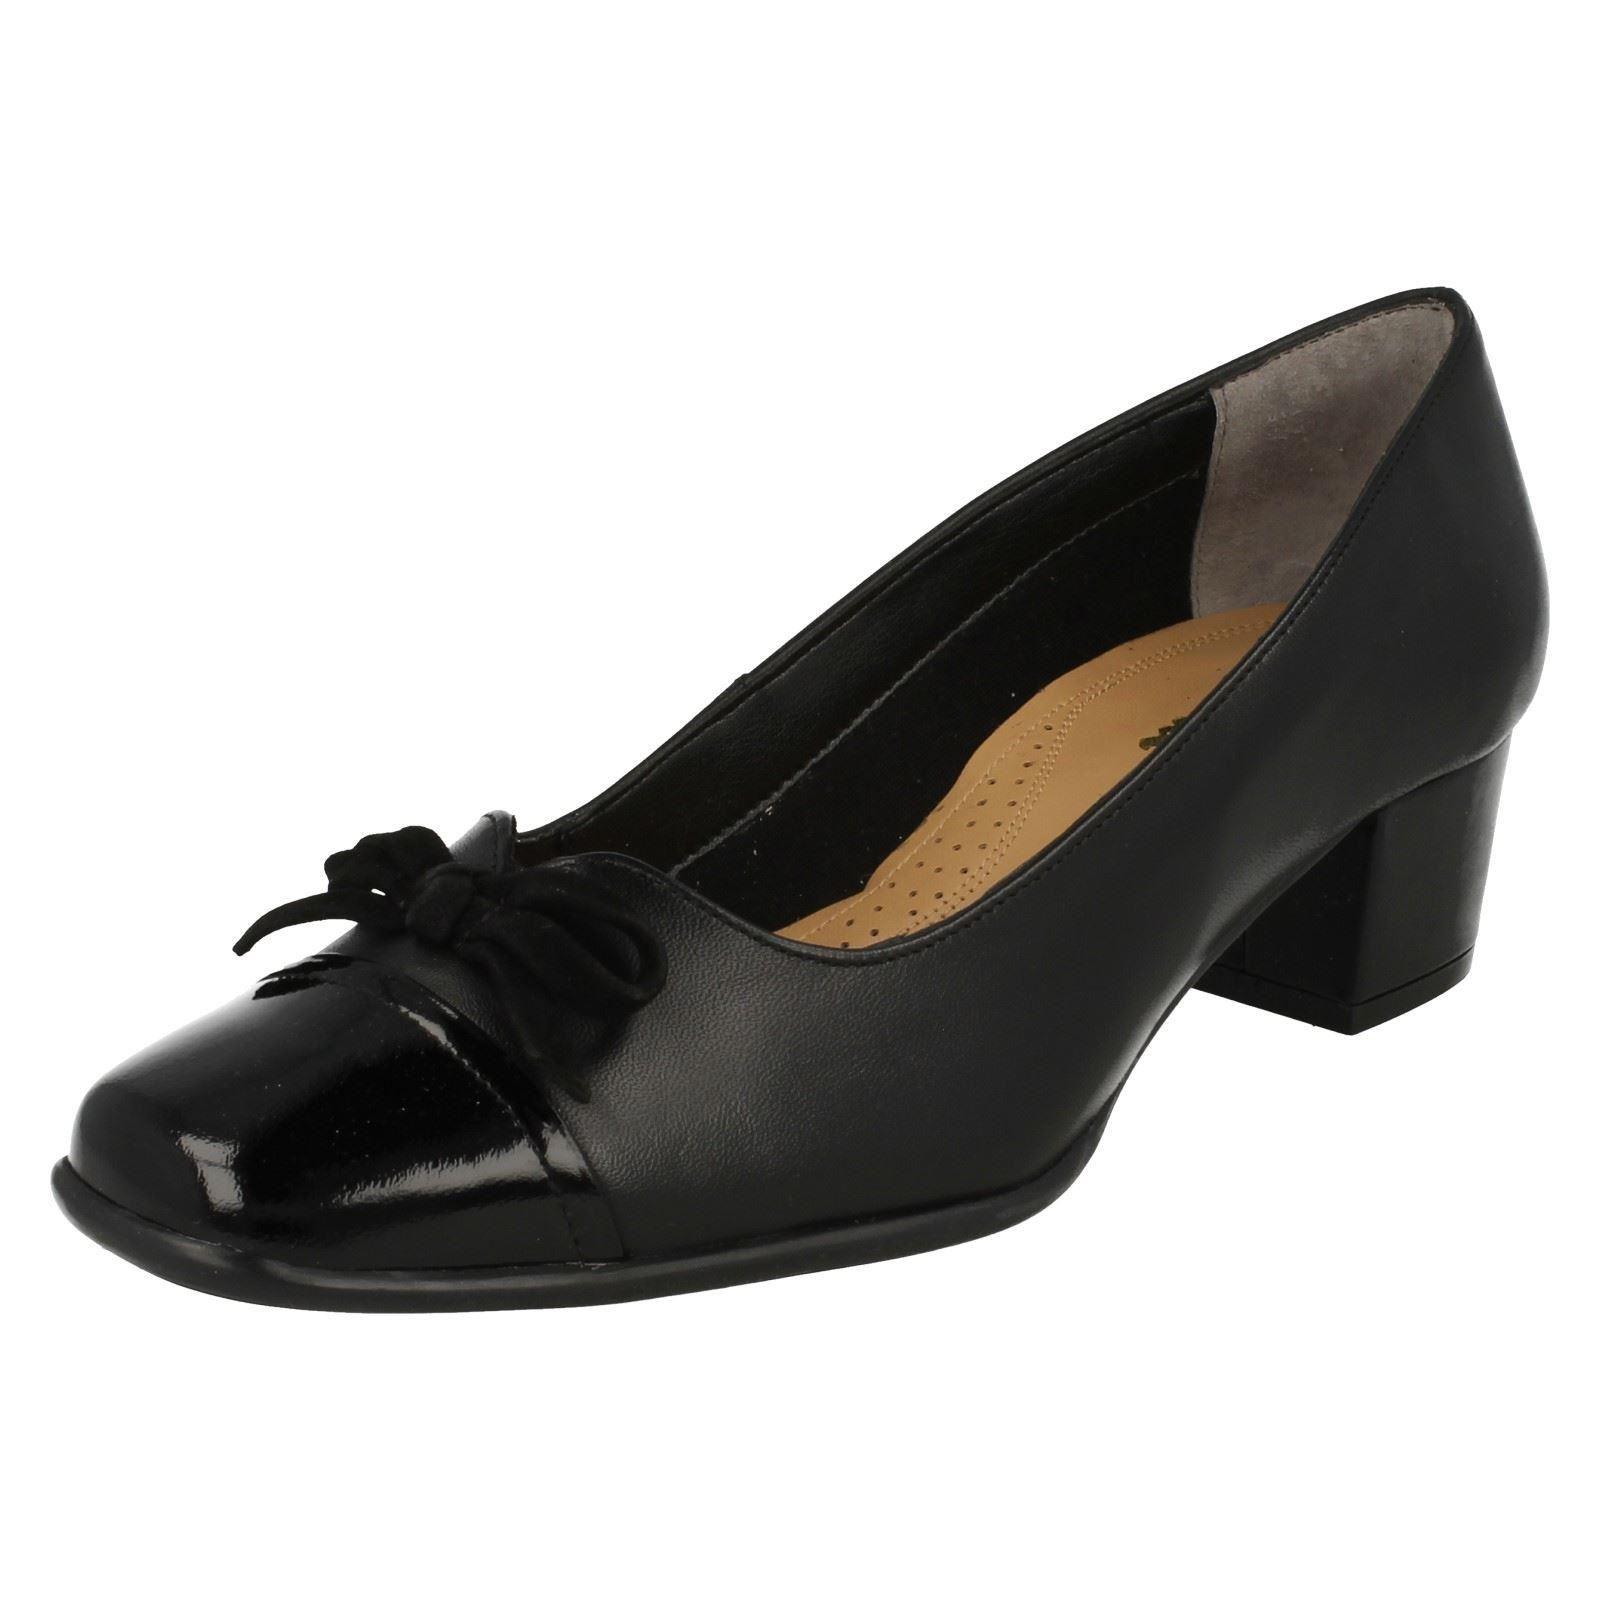 Van Dal Shoe Shop